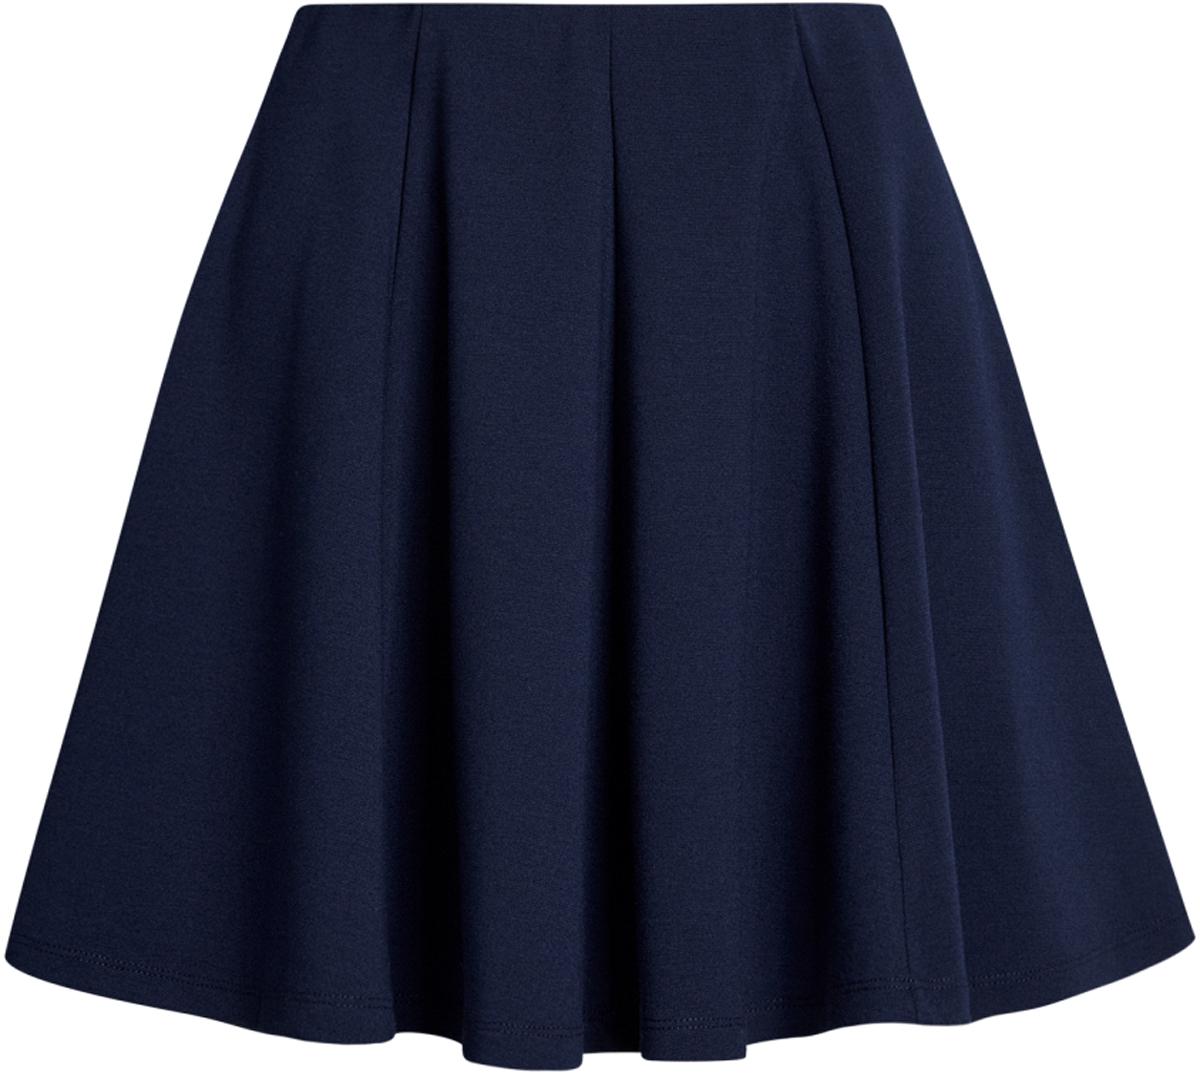 цены  Юбка женская oodji Ultra, цвет: темно-синий. 14102001B/38261/7900N. Размер L (48)